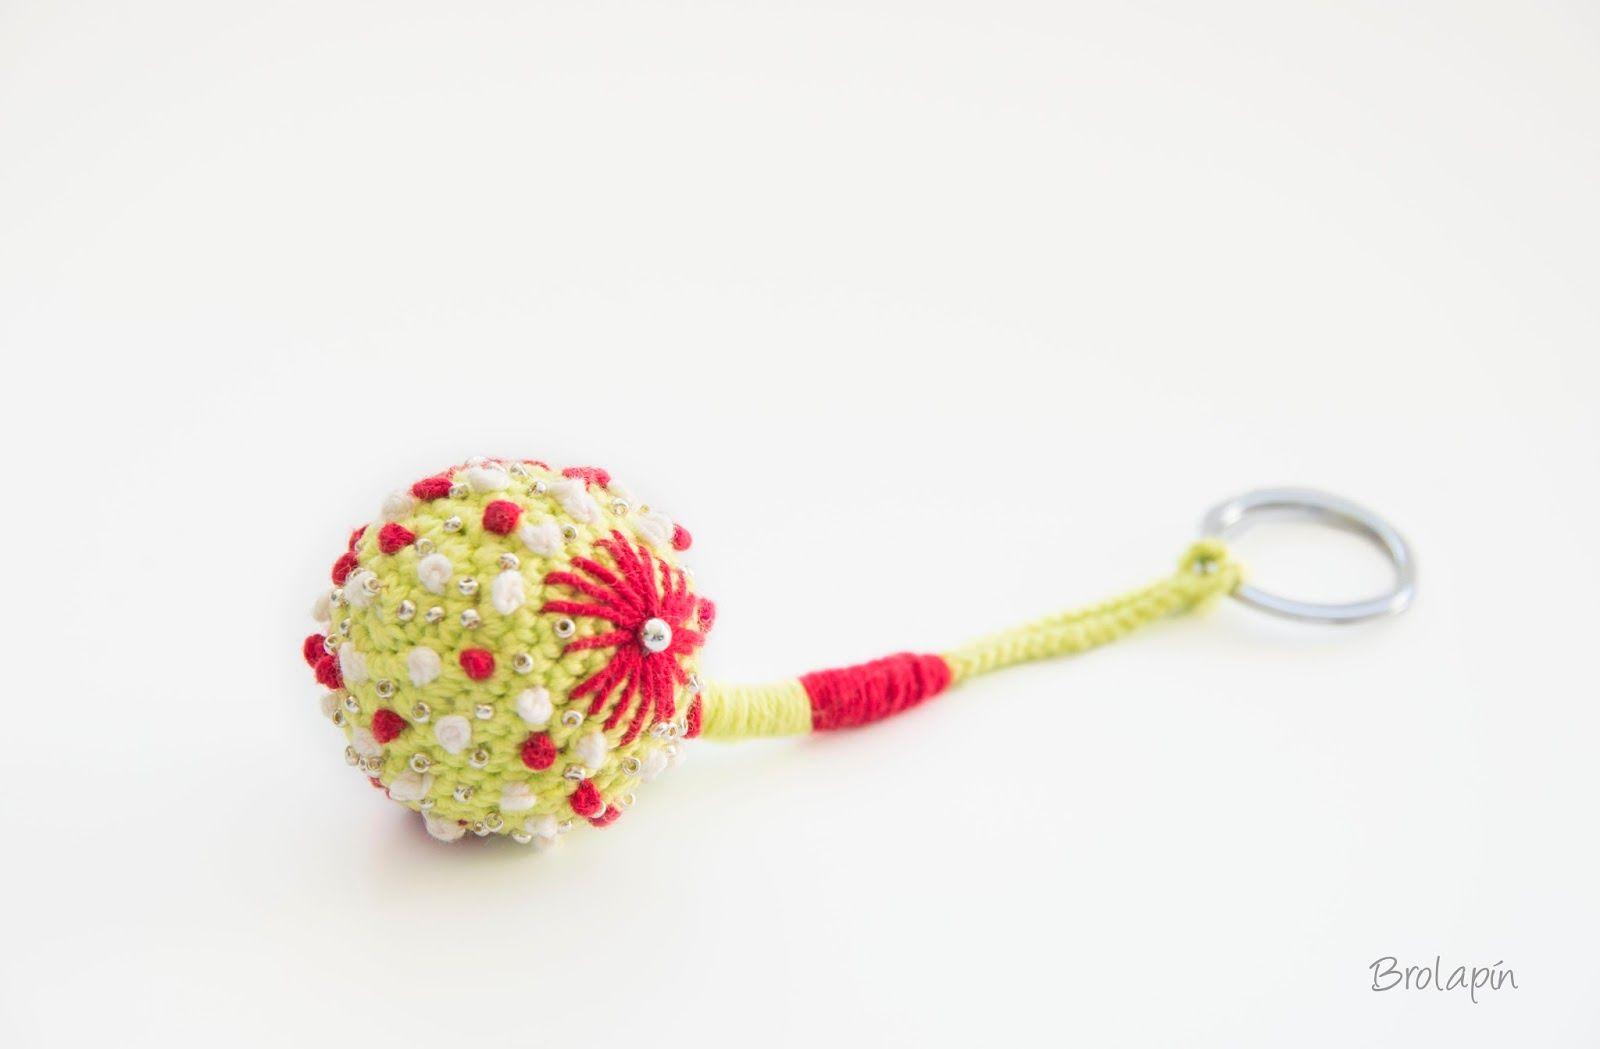 LLaveros crochet con bordados.Brolapin